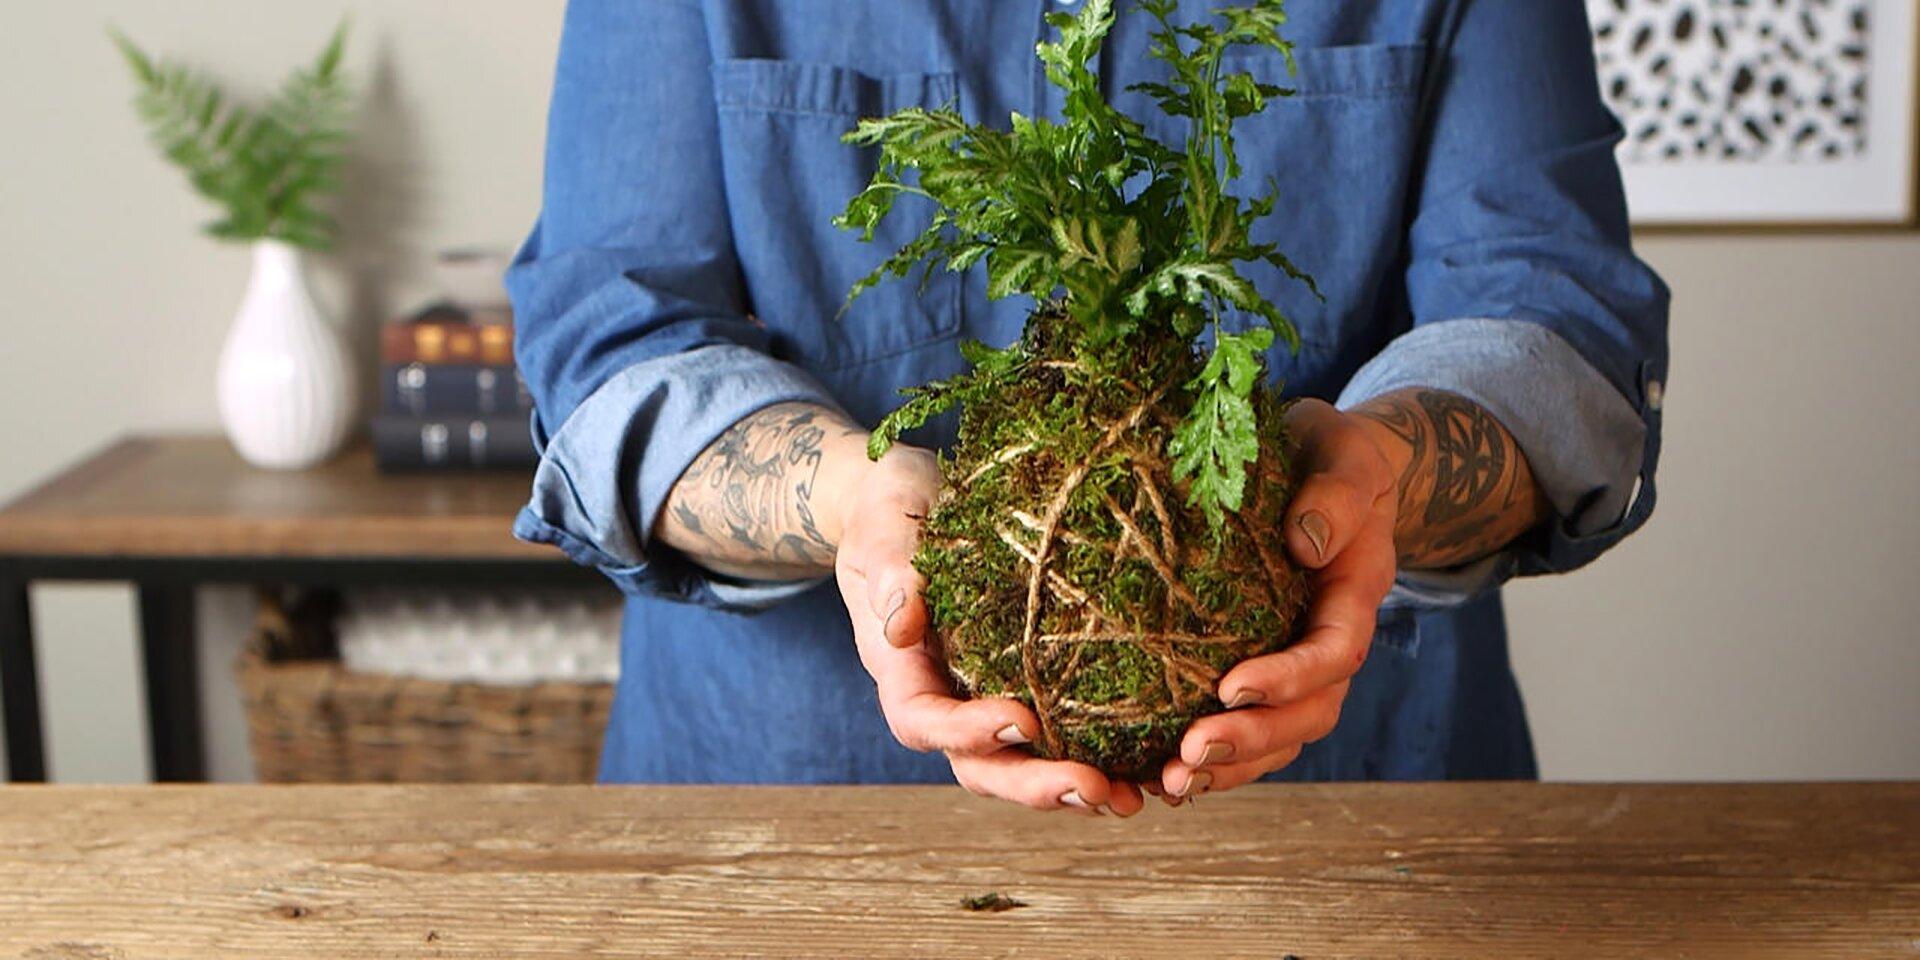 person holding kokedama moss ball houseplant